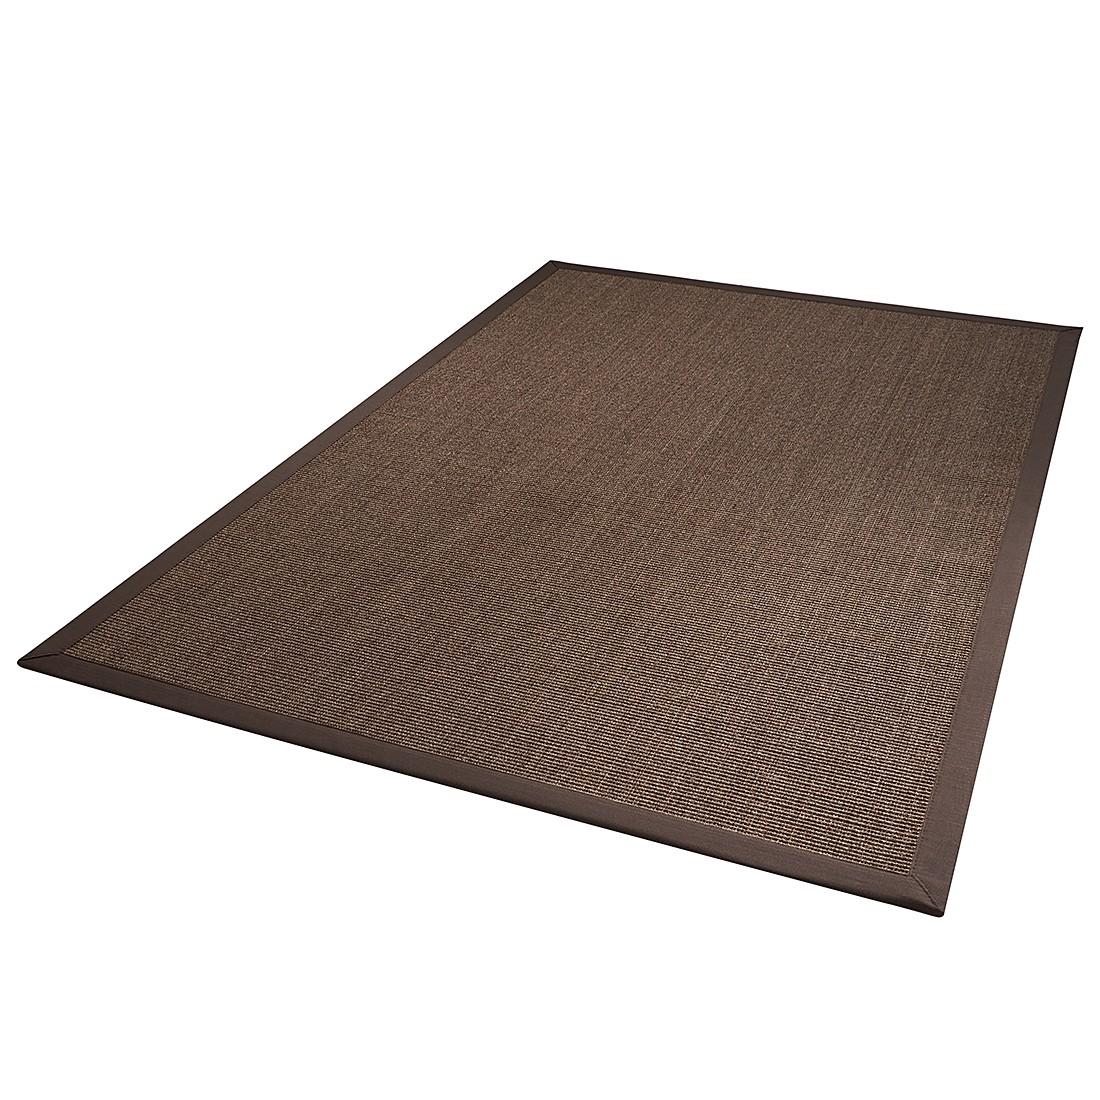 Teppich Mara A2 – Haselnuss – 170 x 230 cm, DEKOWE jetzt bestellen